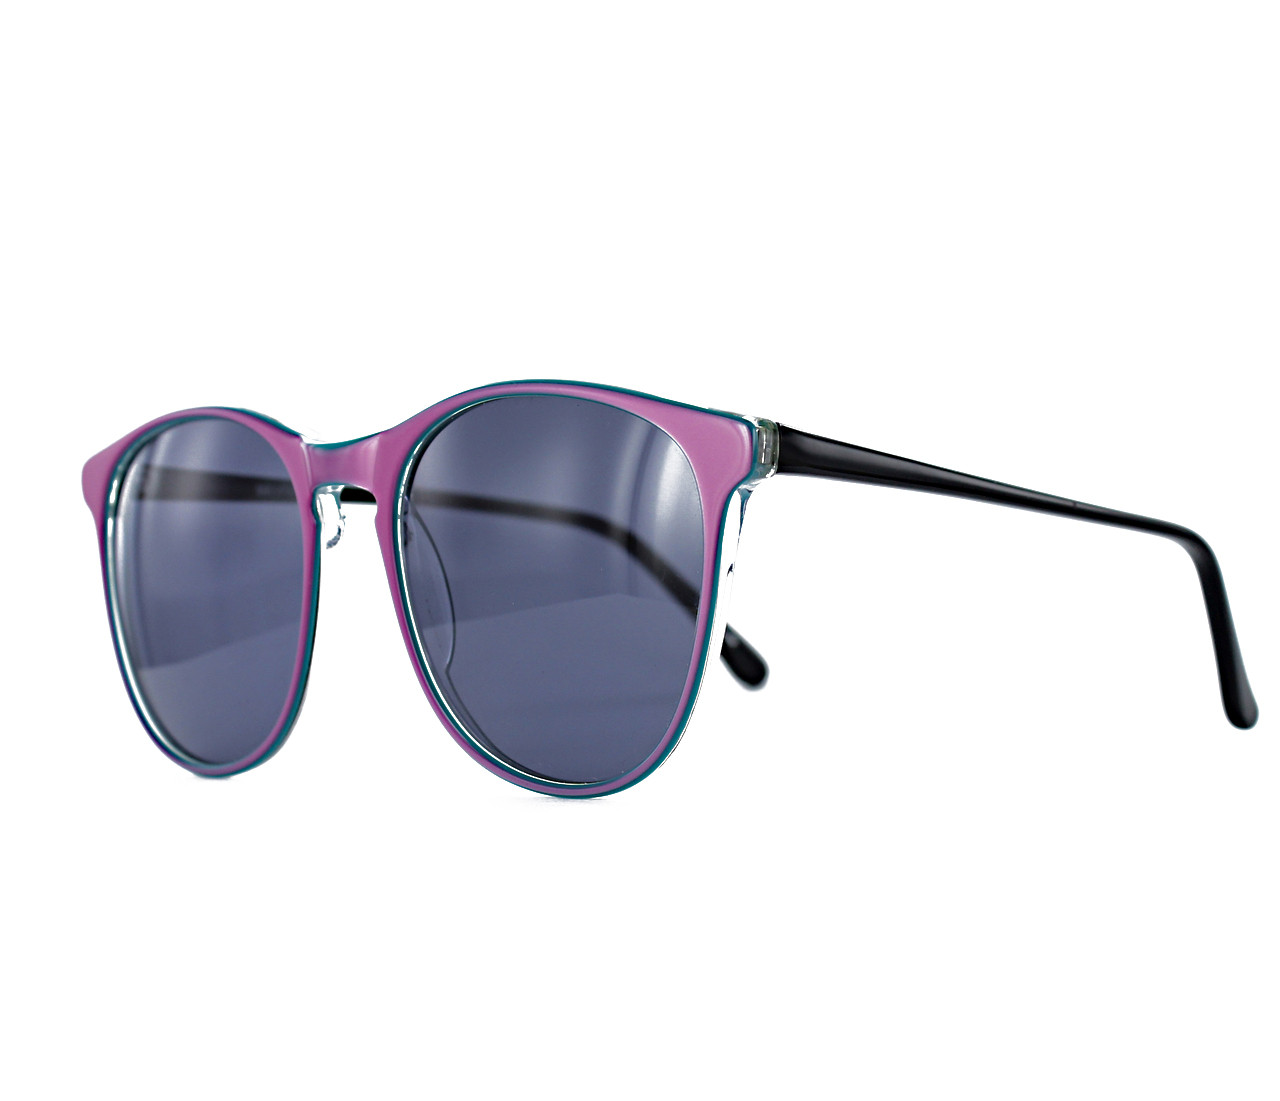 GEEK COUTURE® Ciel Sunglasses